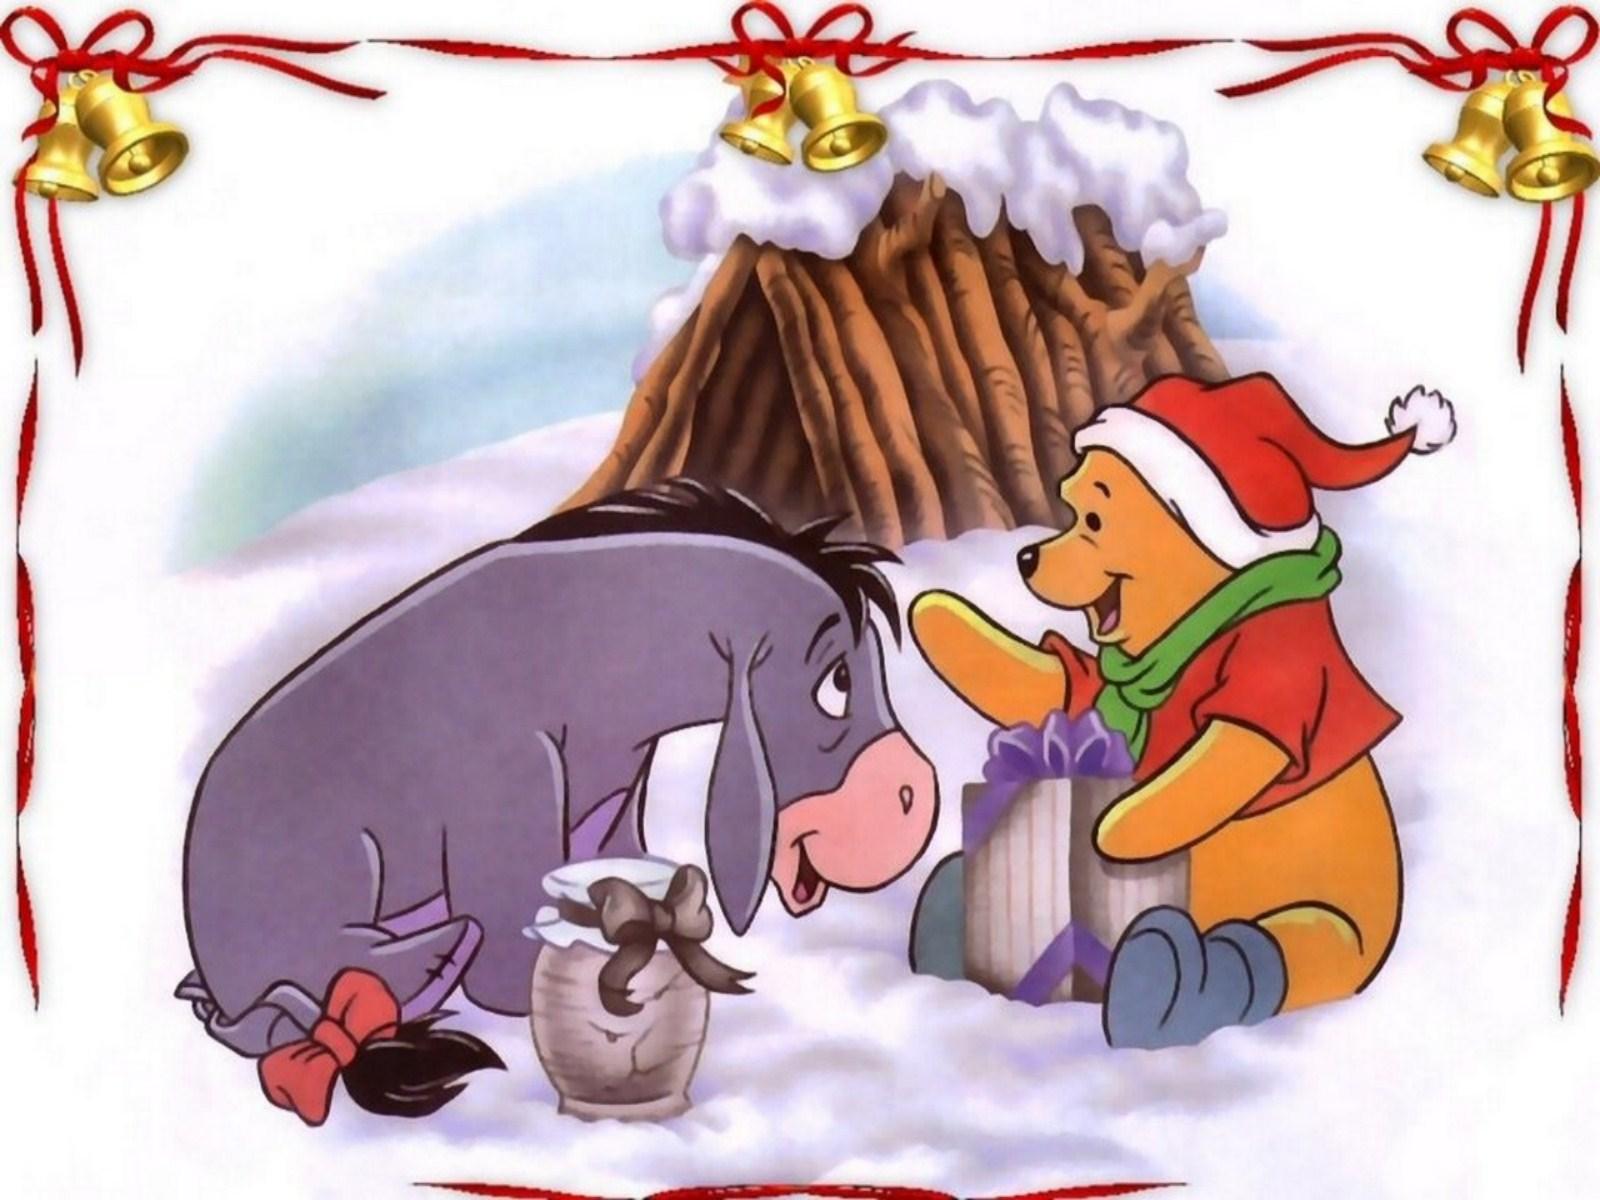 Winnie The Pooh Christmas Wallpaper - 1600x1200 - 265250